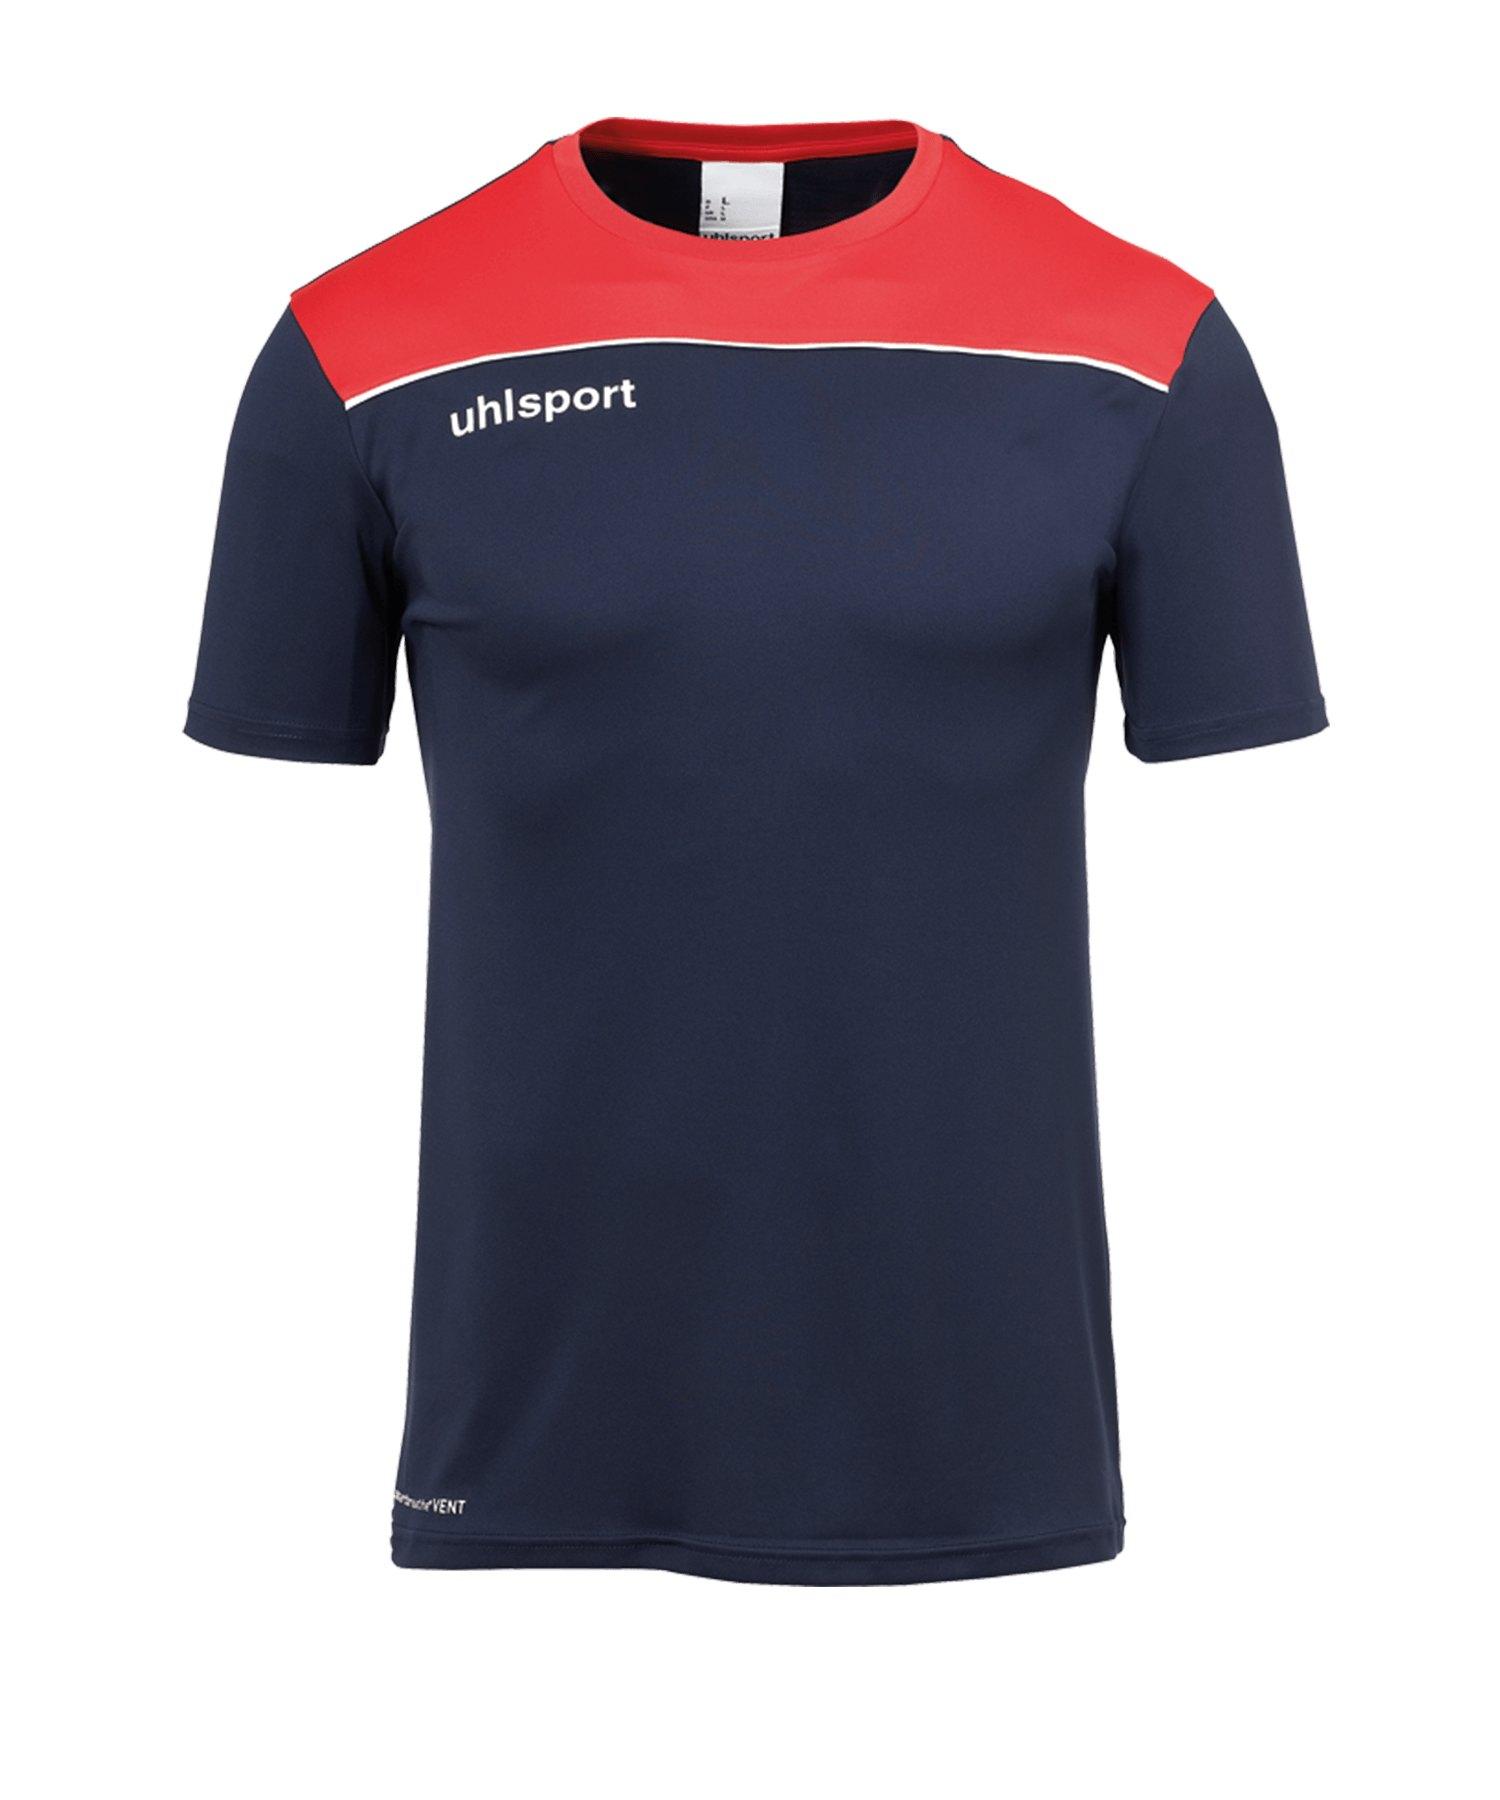 Uhlsport Offense 23 Trainingsshirt Blau Rot F10 - blau